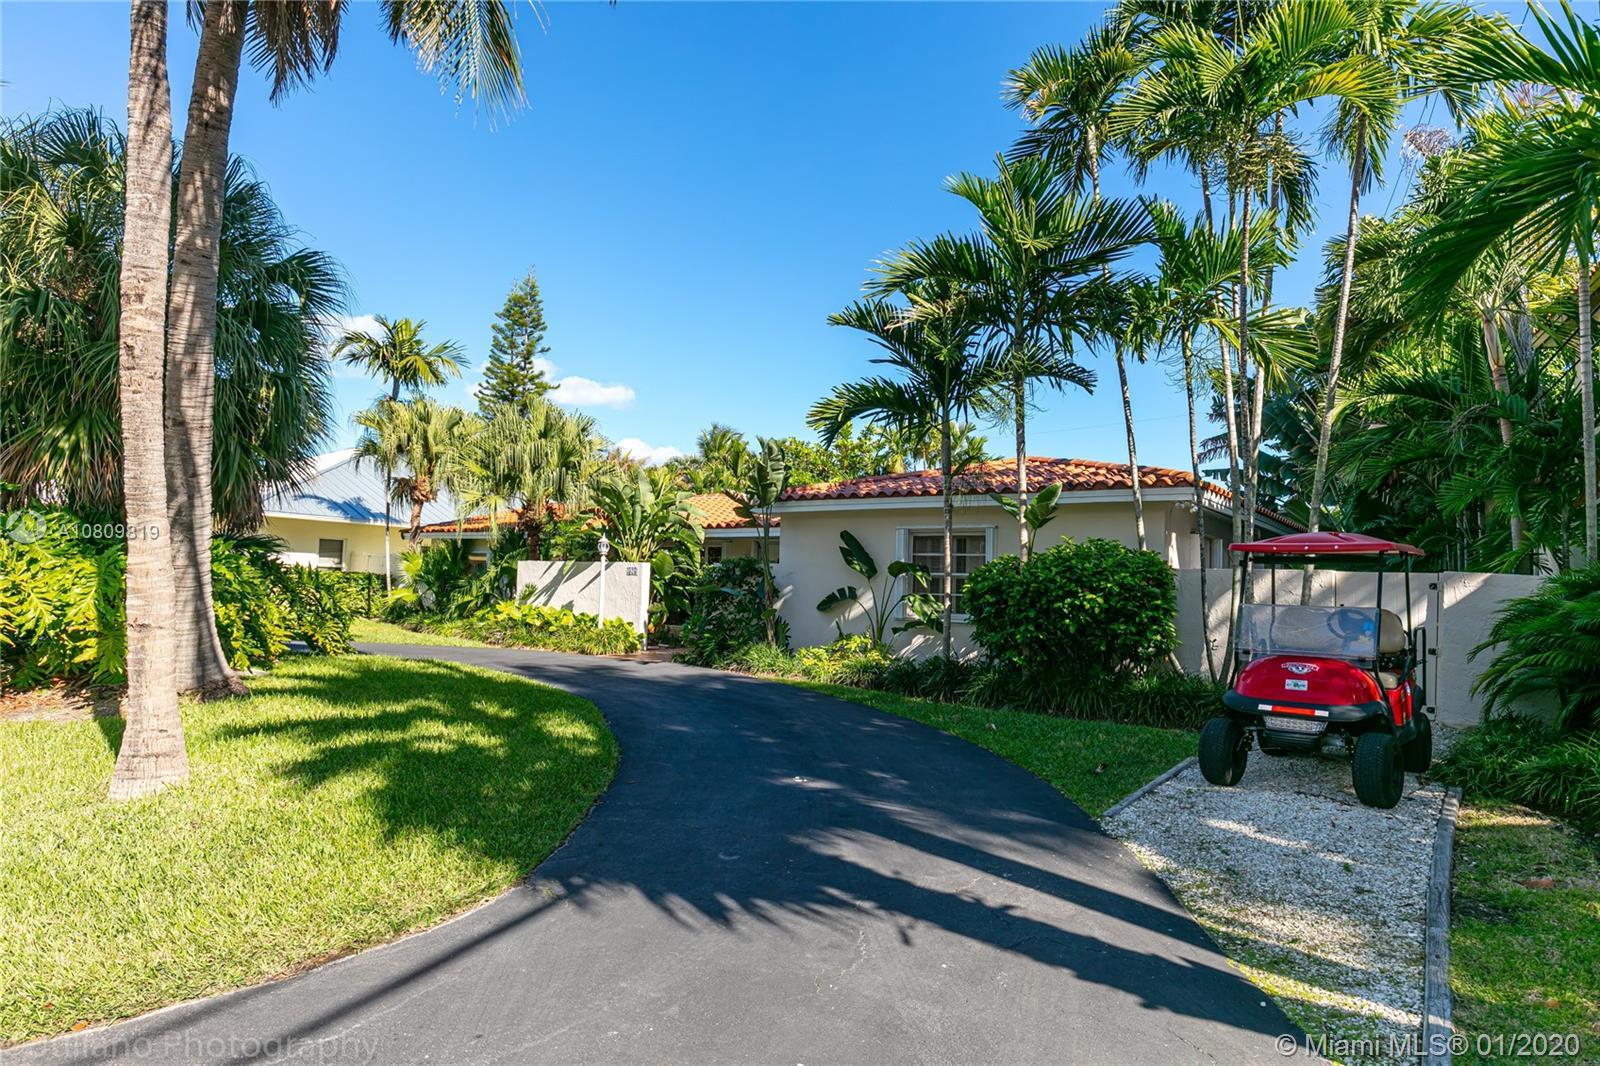 525 Hampton Ln, Key Biscayne, Florida